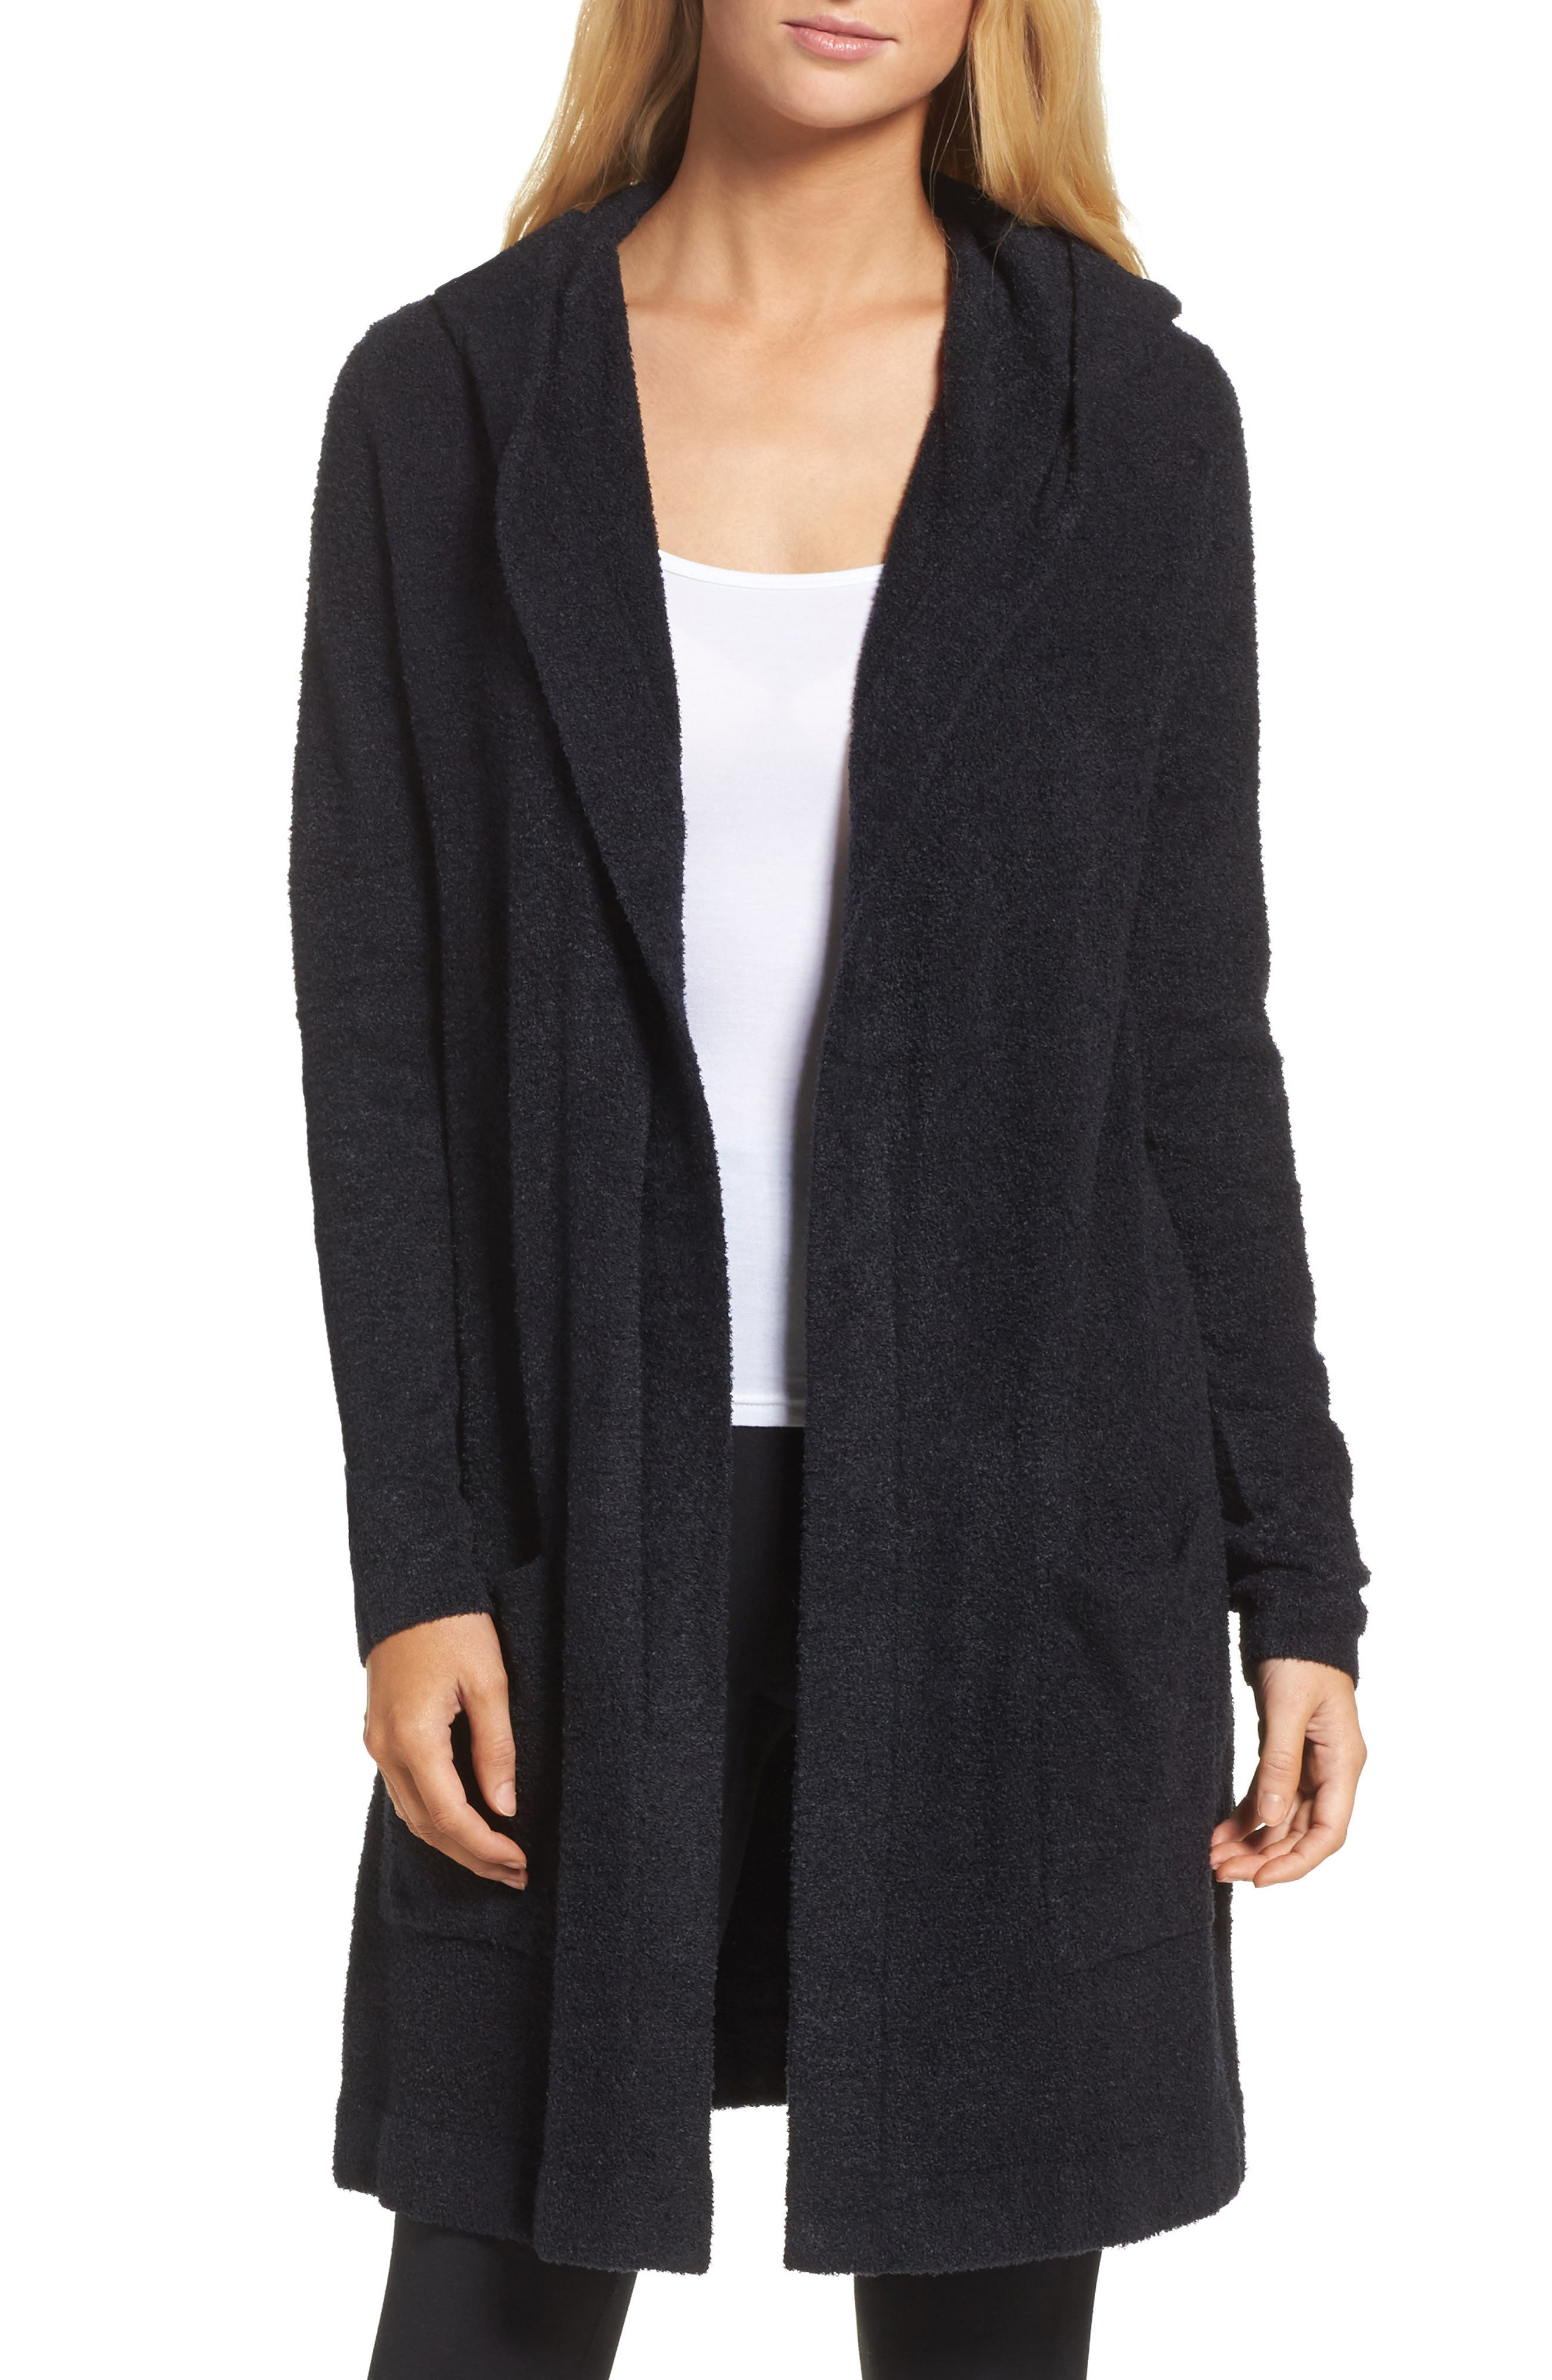 Main Image - Barefoot Dreams® Cozychic Lite® Coastal Hooded Cardigan